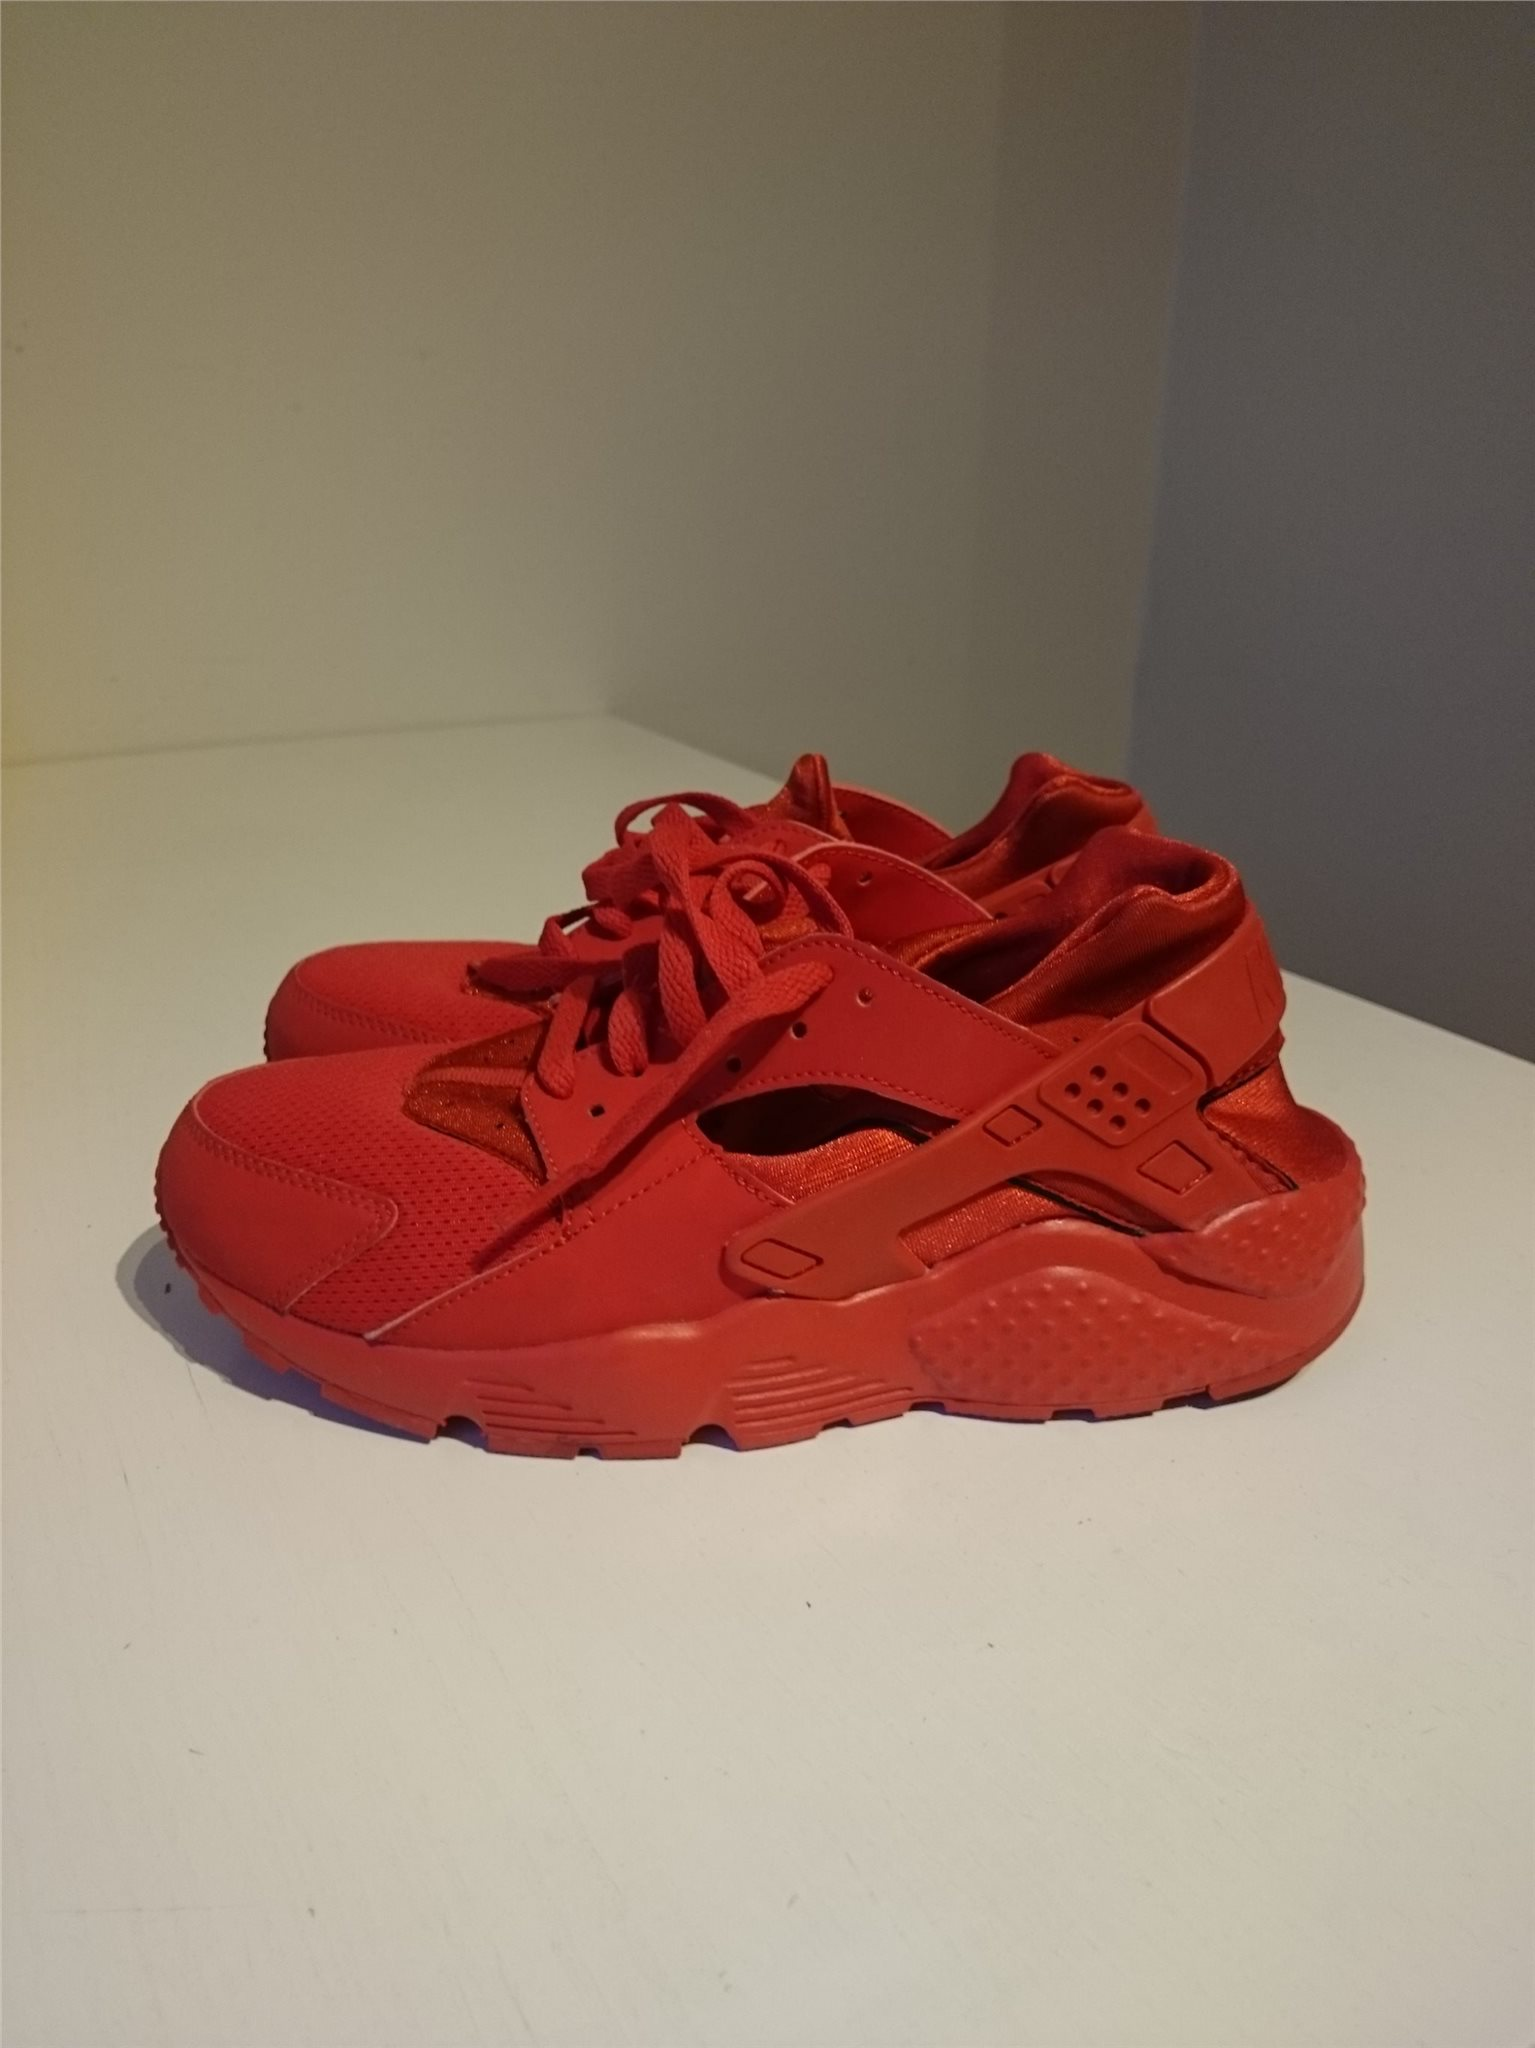 c0b9553080b Röda Huarache Nike sneakers i strl 40 (334454692) ᐈ Köp på Tradera